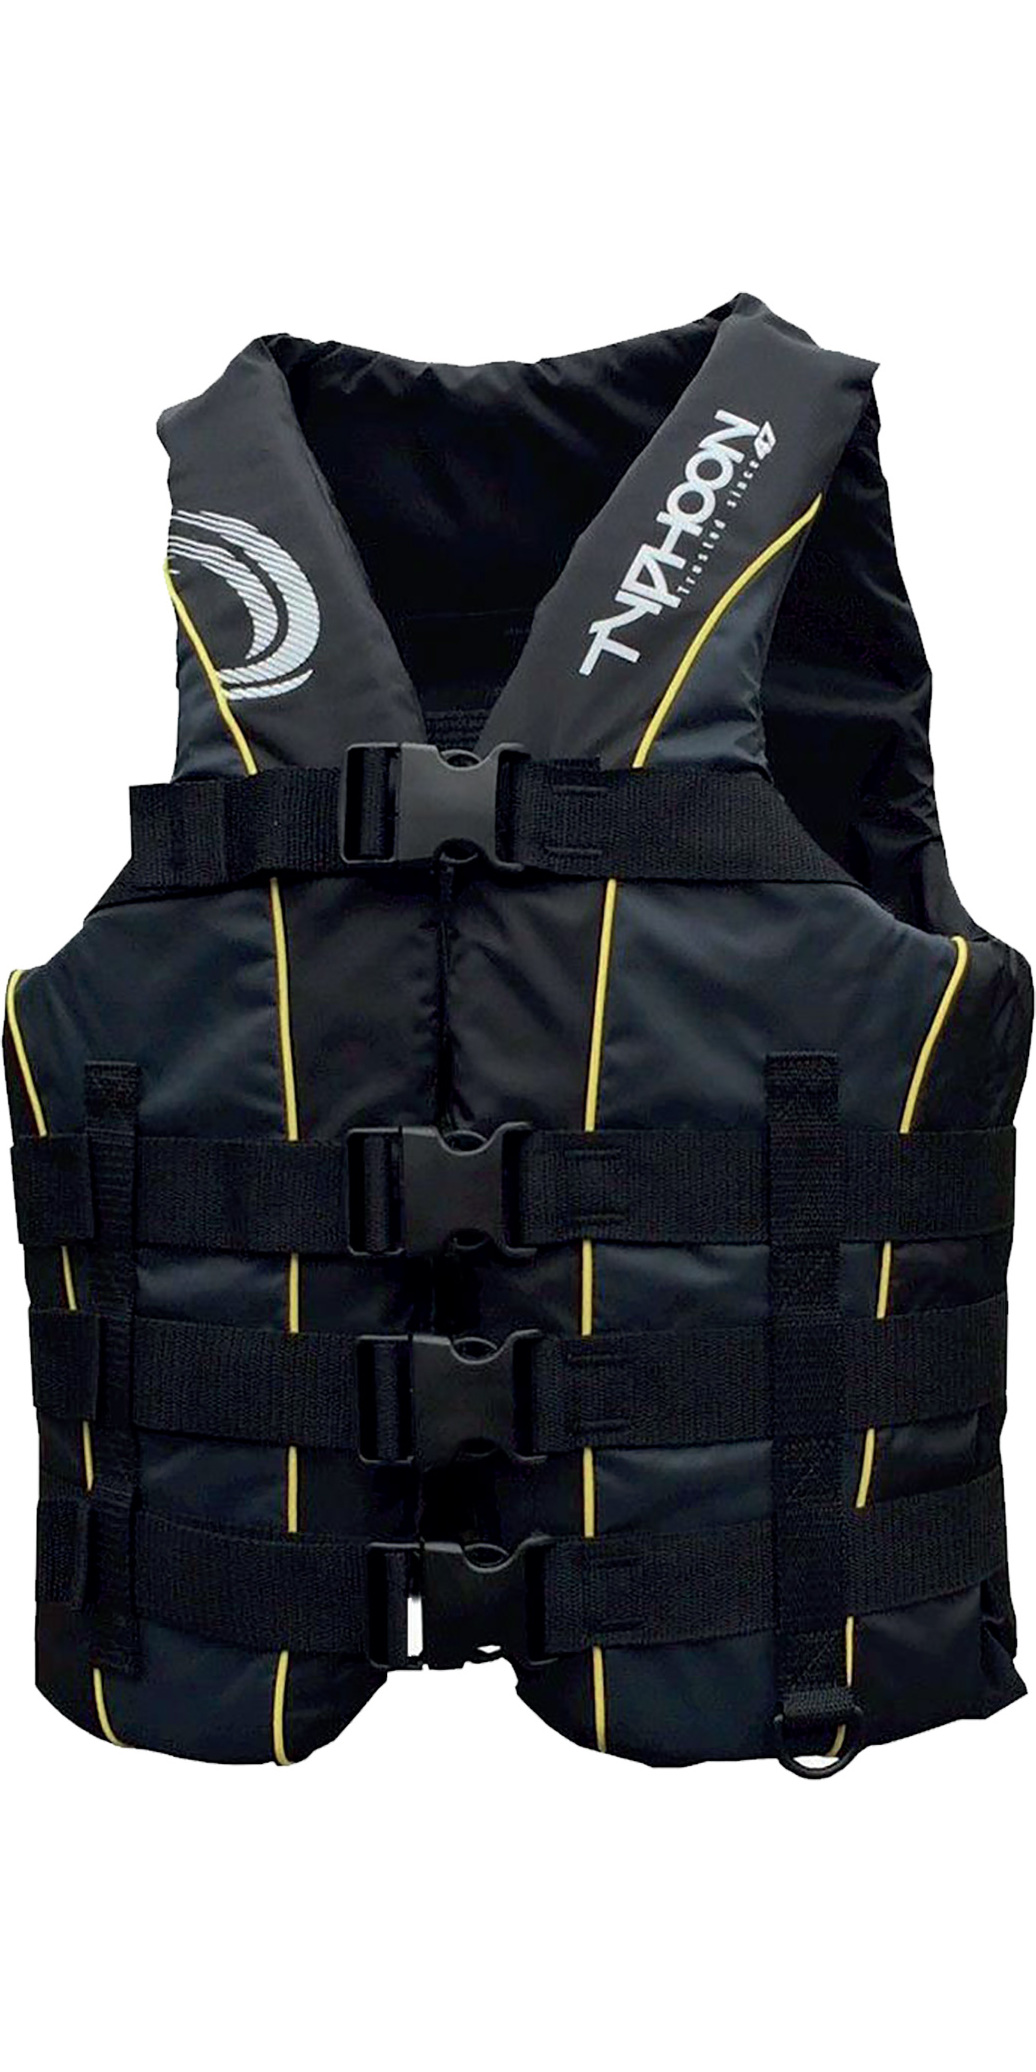 2020 Typhoon 4 Buckle Impact Ski Vest Black / Grey 410108